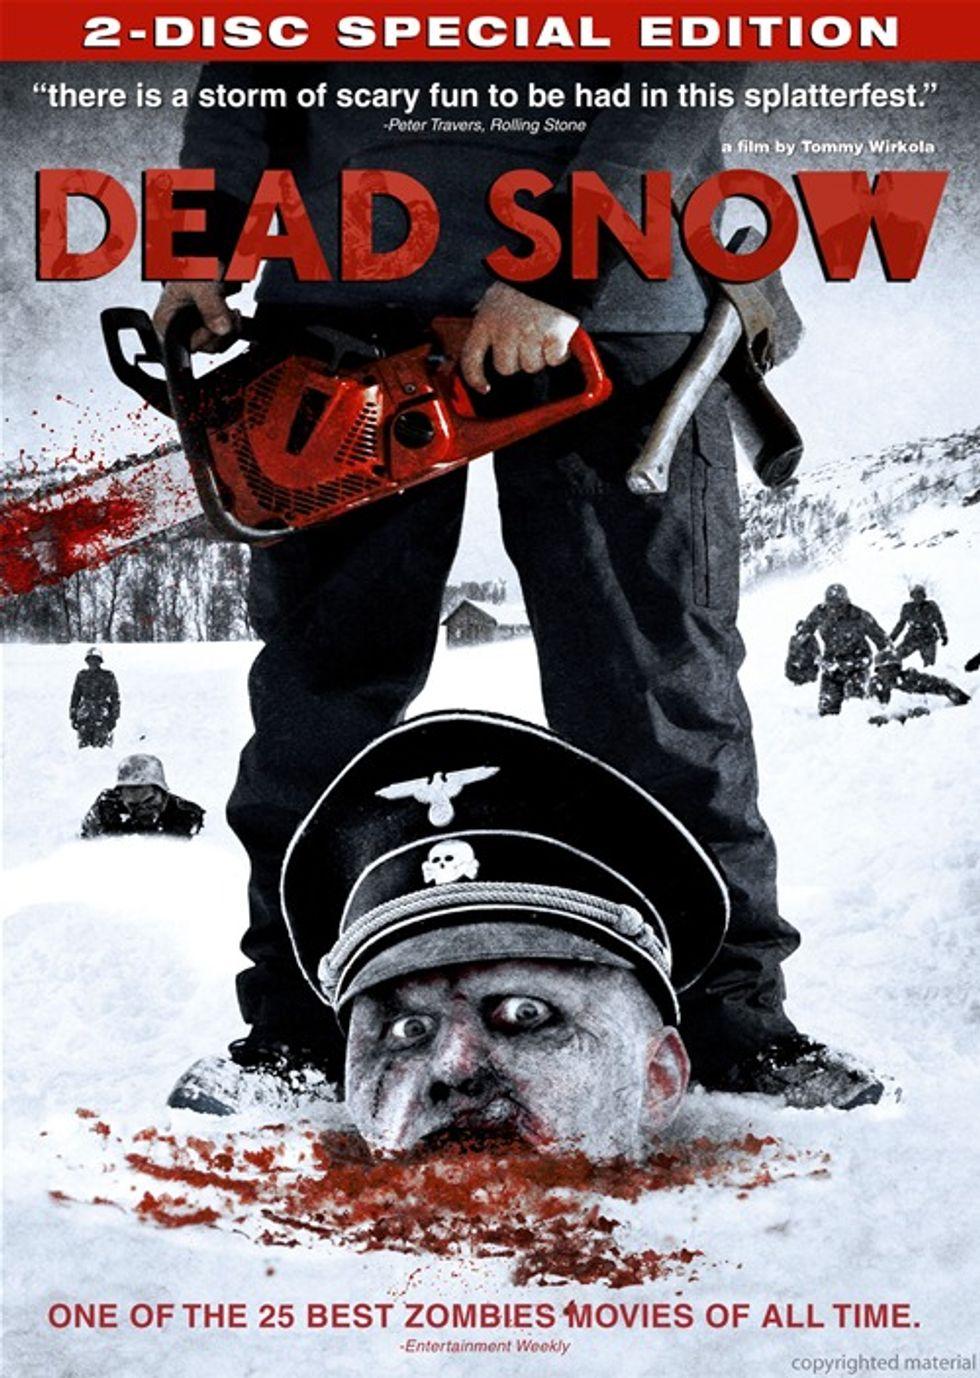 Intestine Chomping and Chainsaw Mayhem in Nazi Zombie Flick Dead Snow.